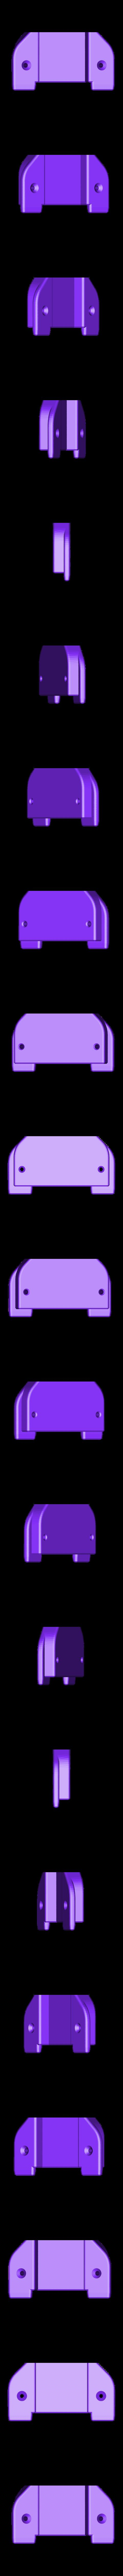 Klickfix.stl Download free STL file Klickfix wall mount for Ortlieb handlebar bag • 3D printable model, ewap